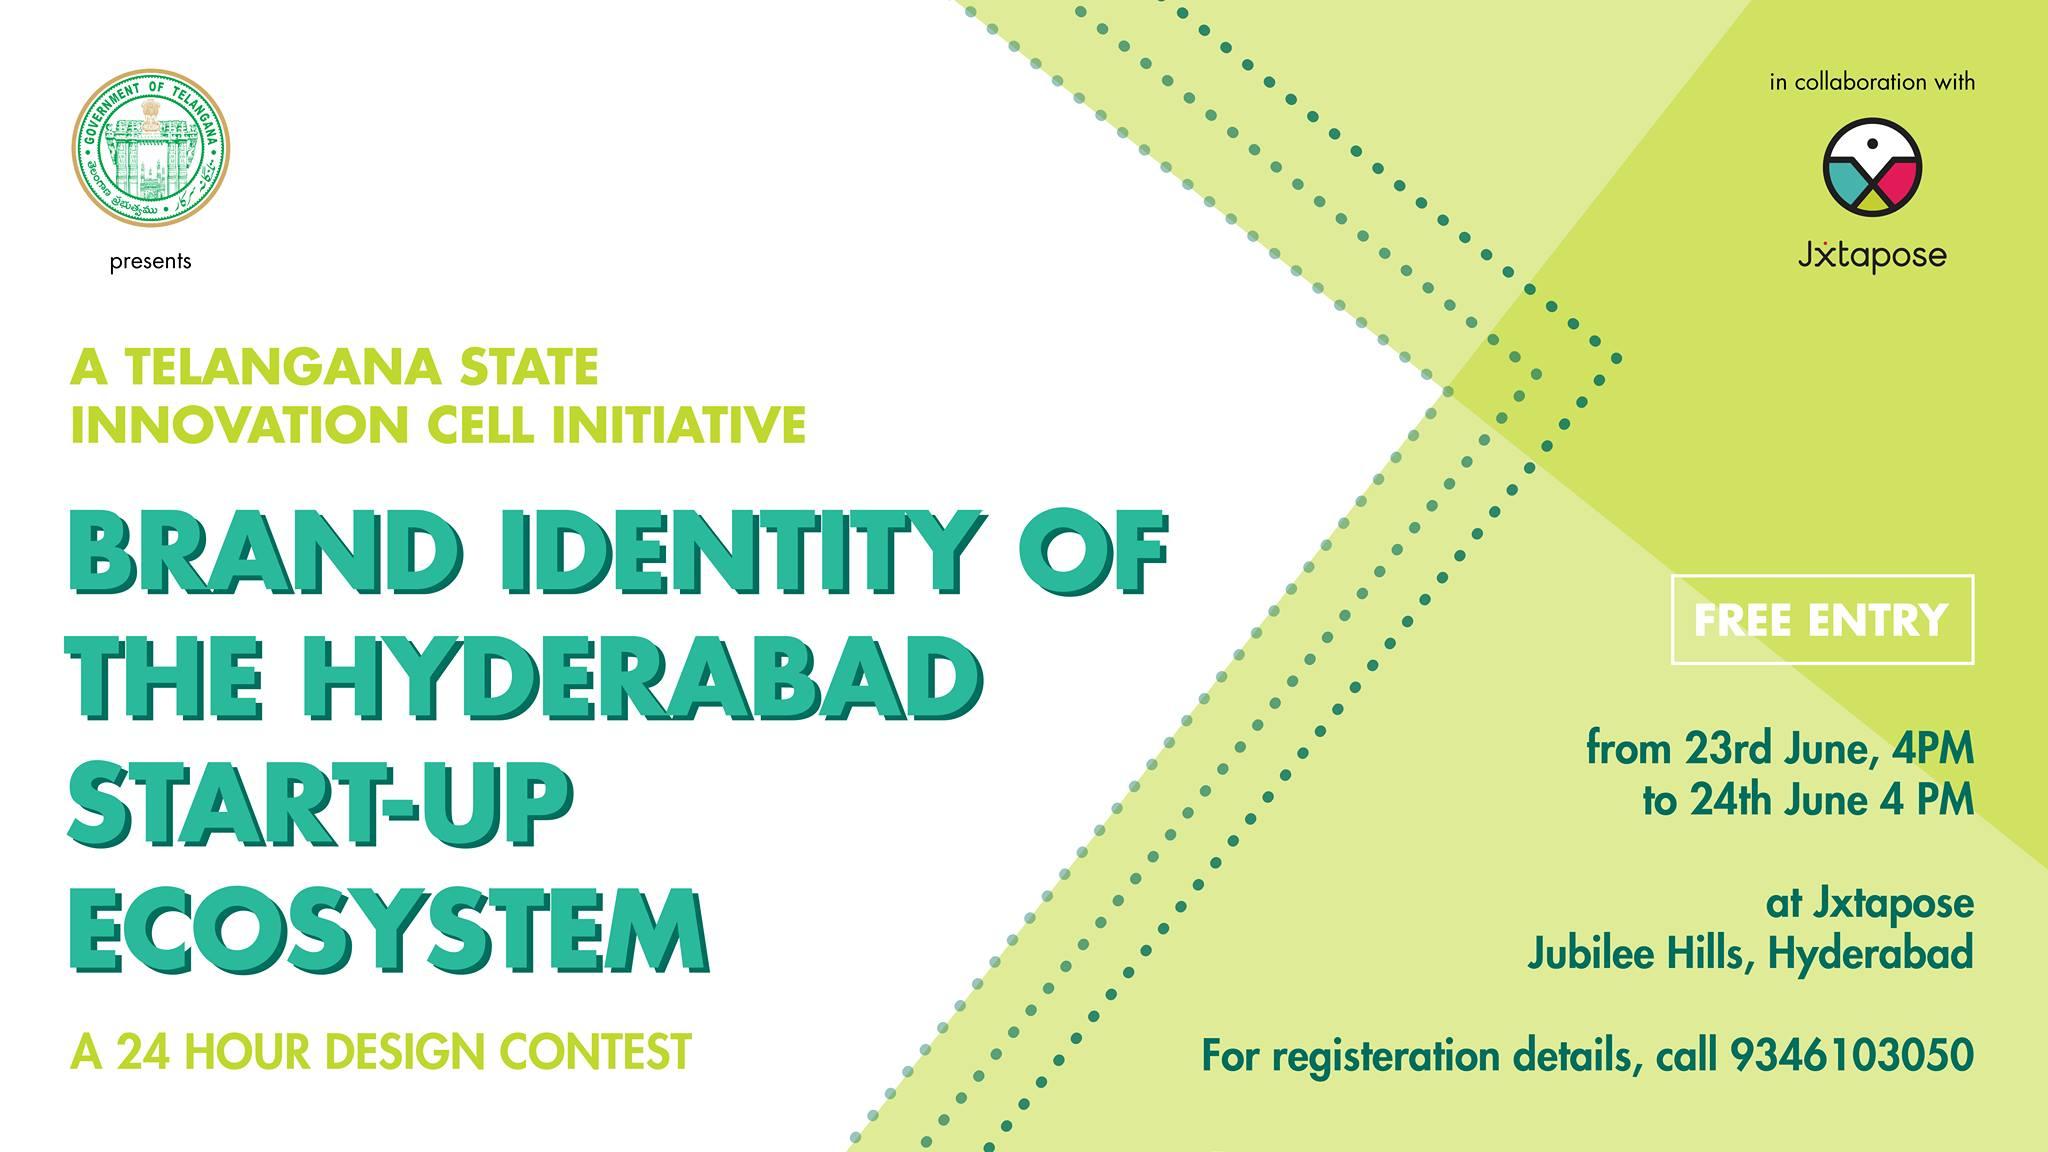 Hyderabad Start-Up Ecosystem